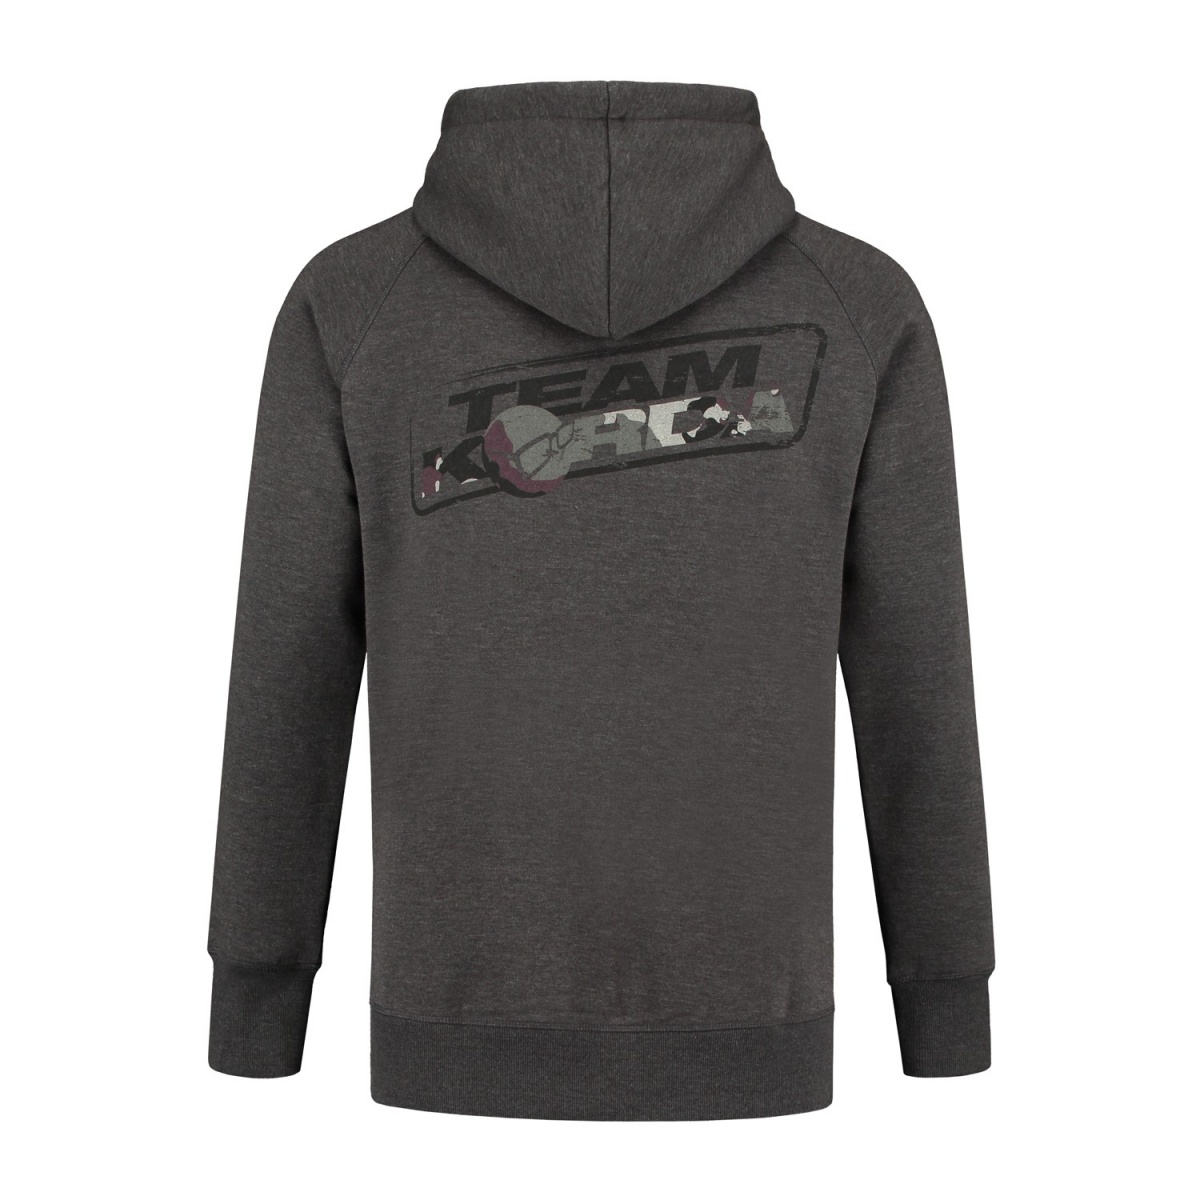 Korda Limited Edition TK Hoodie Charcoal